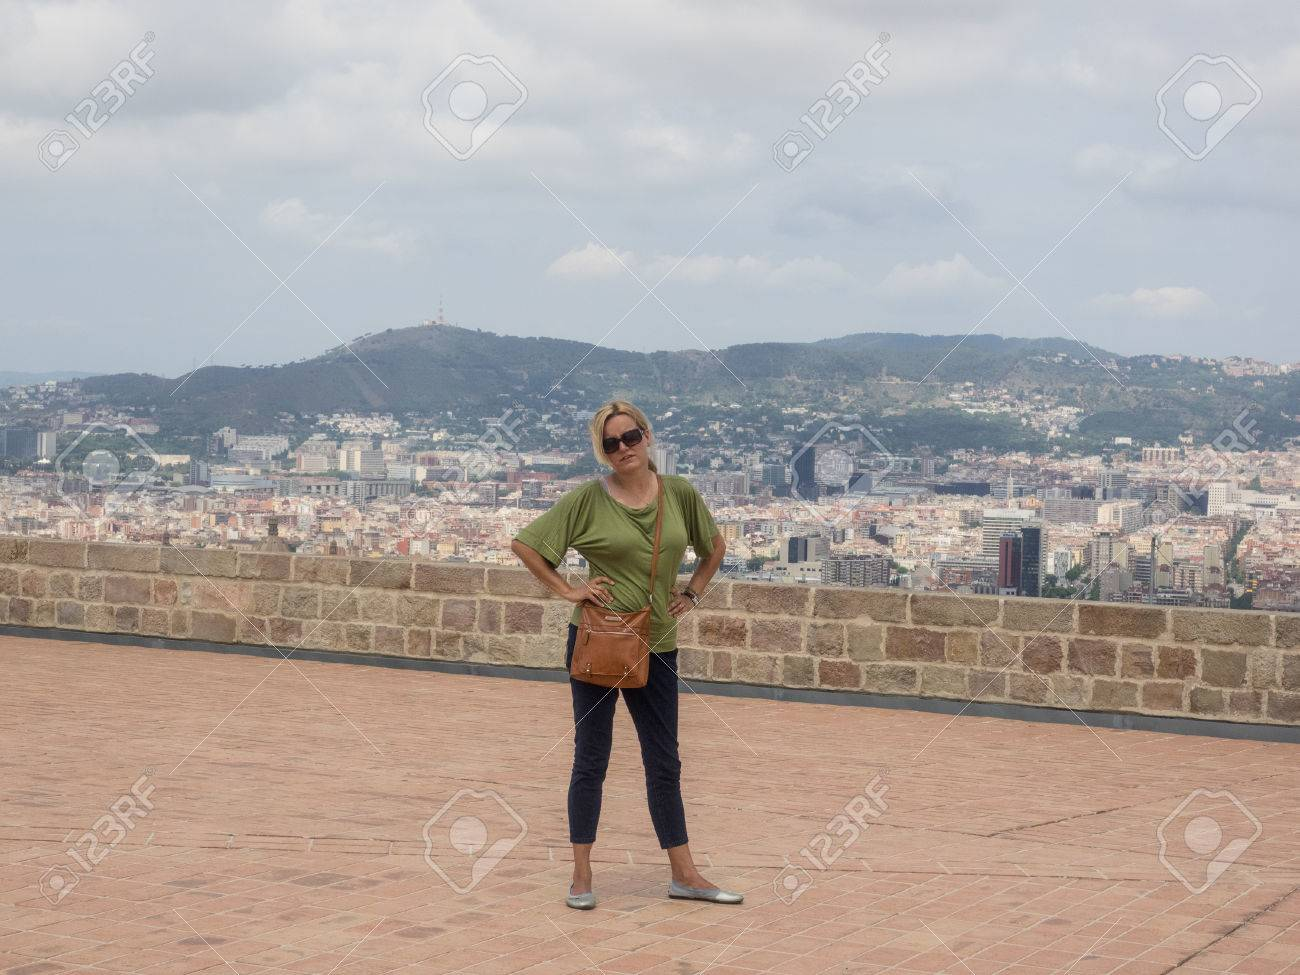 Montjuïc Castle Is An Old Military Fortress Built On Top Of Montjuïc